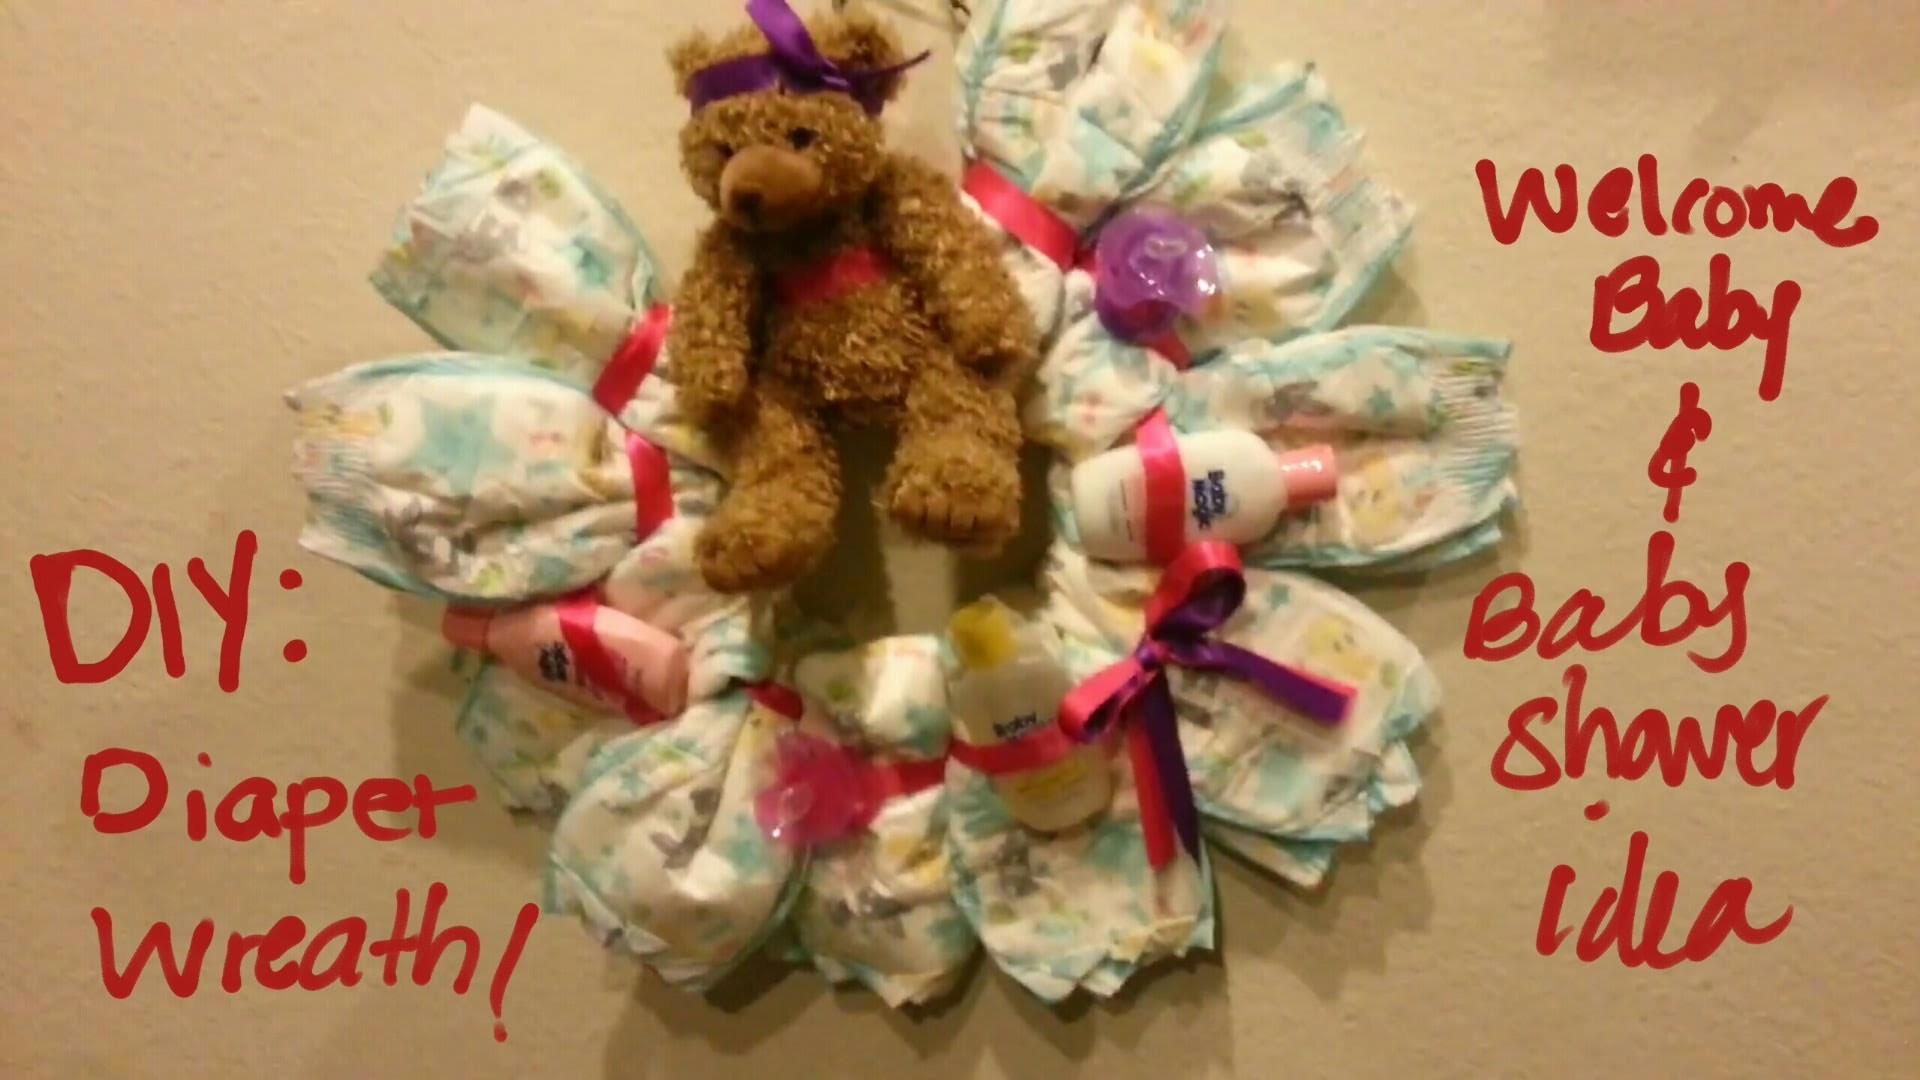 DIY: Diaper wreath,  welcome baby or baby shower idea